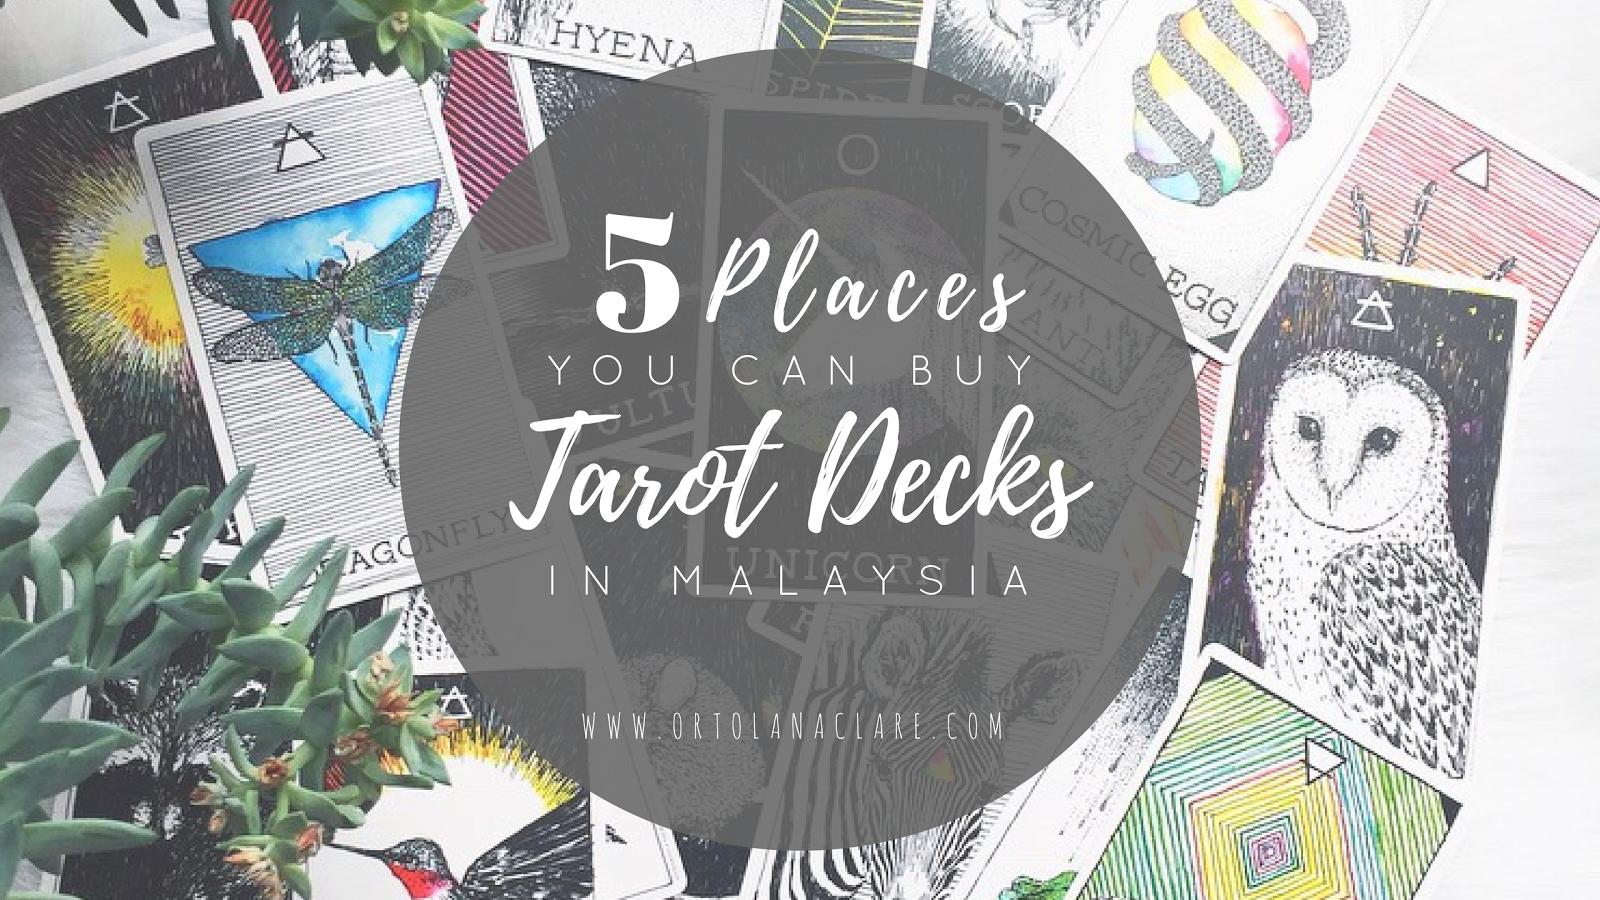 5 Places You Can Buy Tarot Decks In Malaysia Ortolana Clare